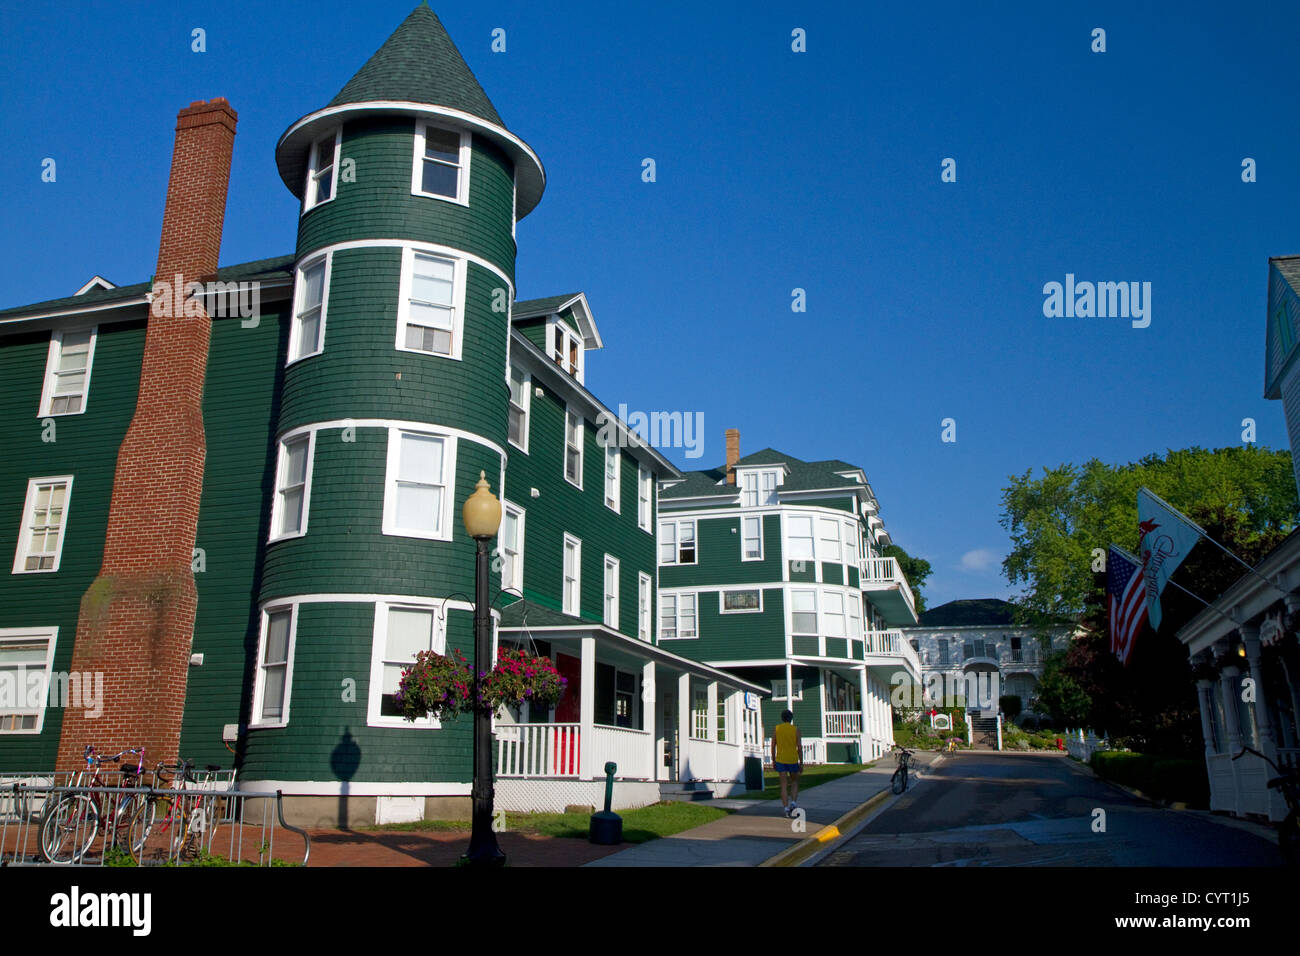 Historic building on Mackinac Island located in Lake Huron, Michigan, USA. Stock Photo